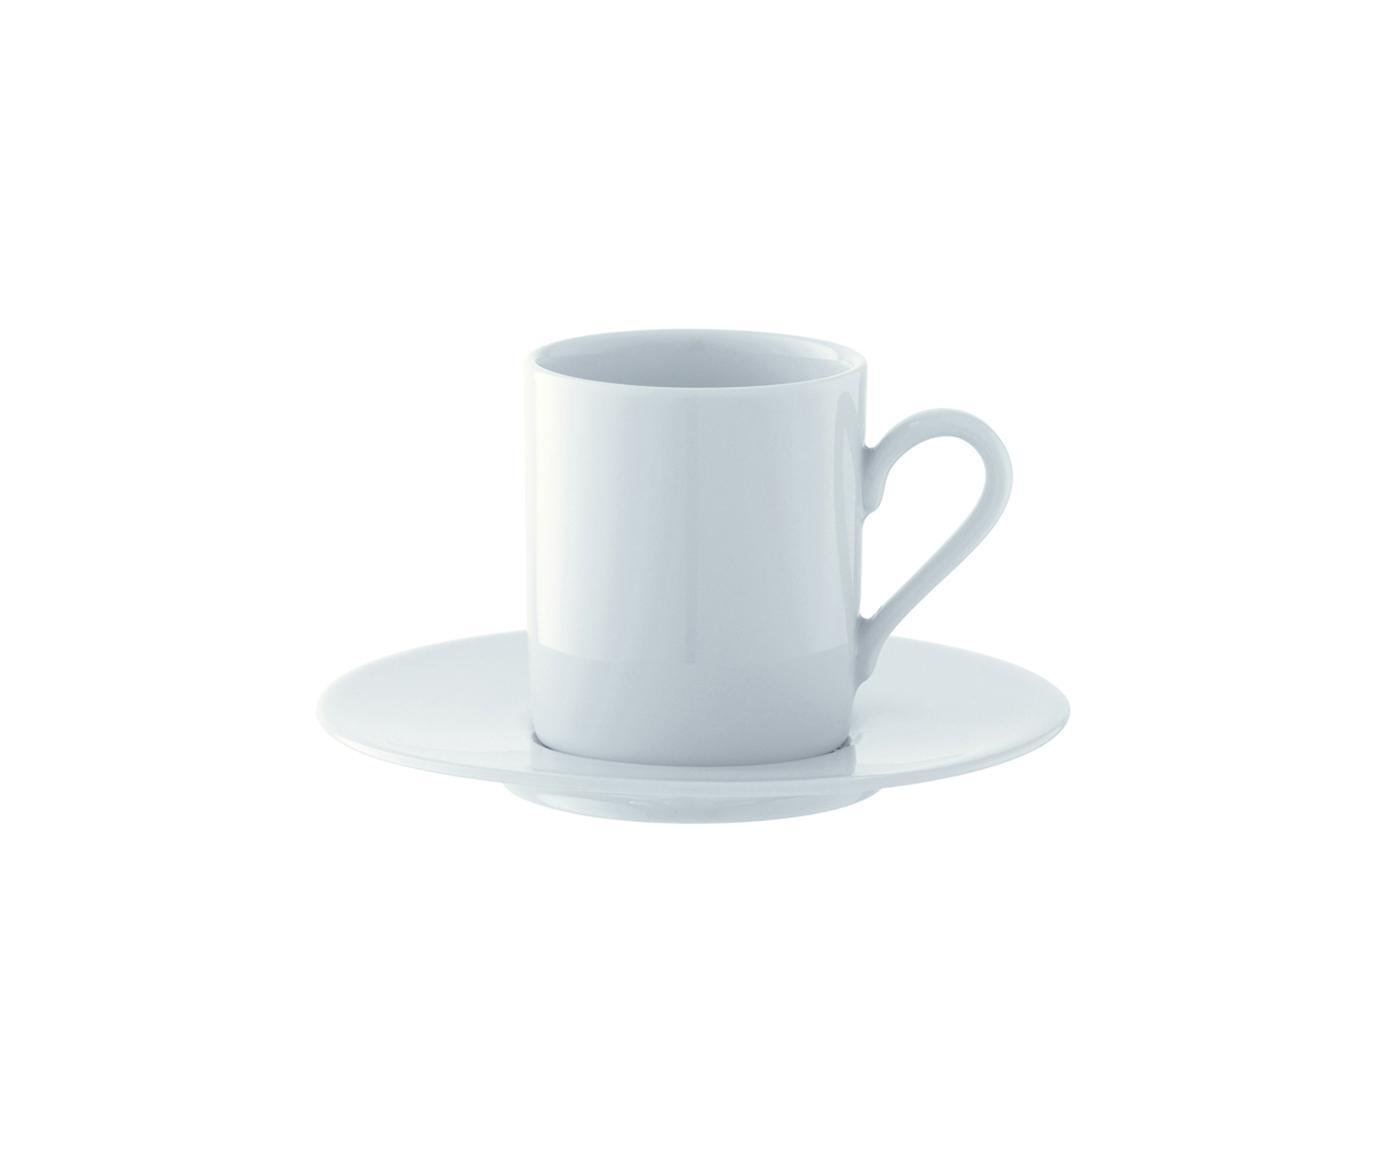 Set 8 tazzine da caffè Bianco, Porcellana, Bianco, Ø 12 x Alt. 7 cm